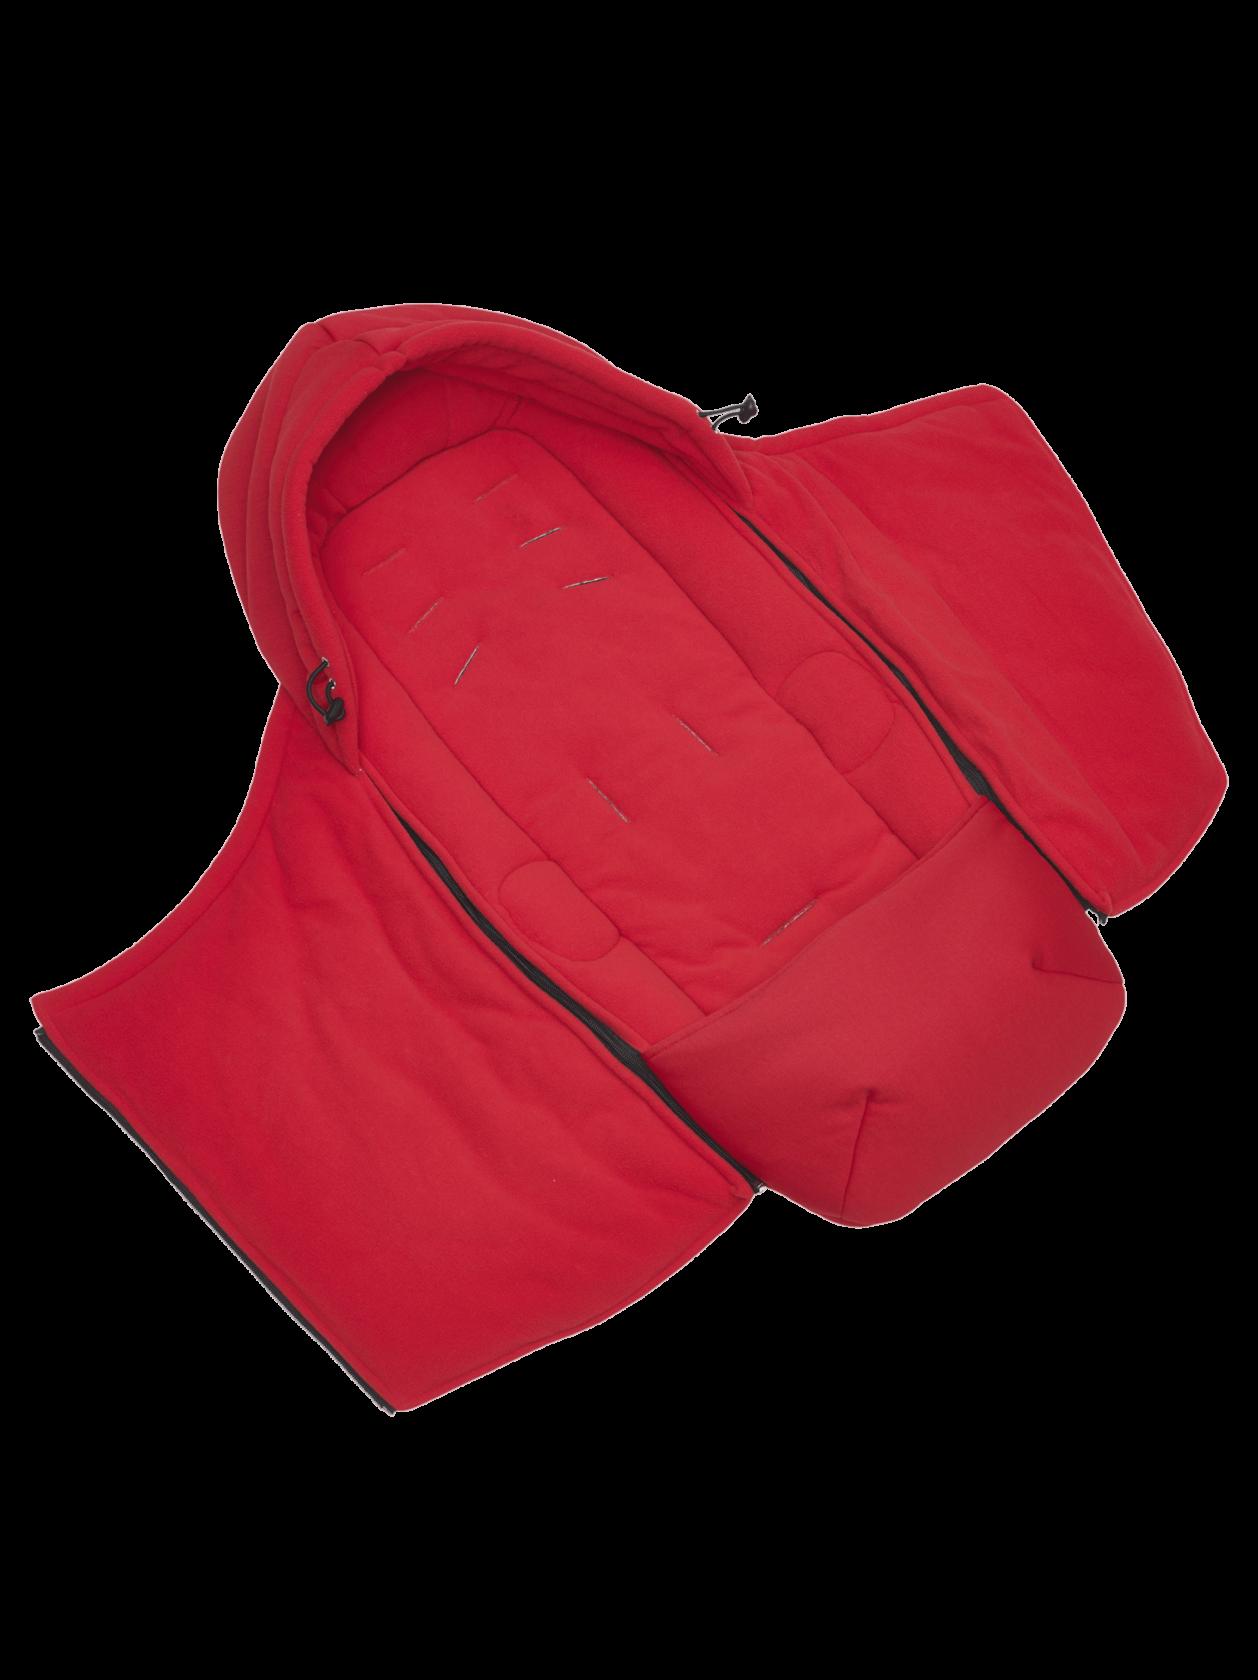 Newborn Pod for iCandy Peach Main Carrycot - Lush